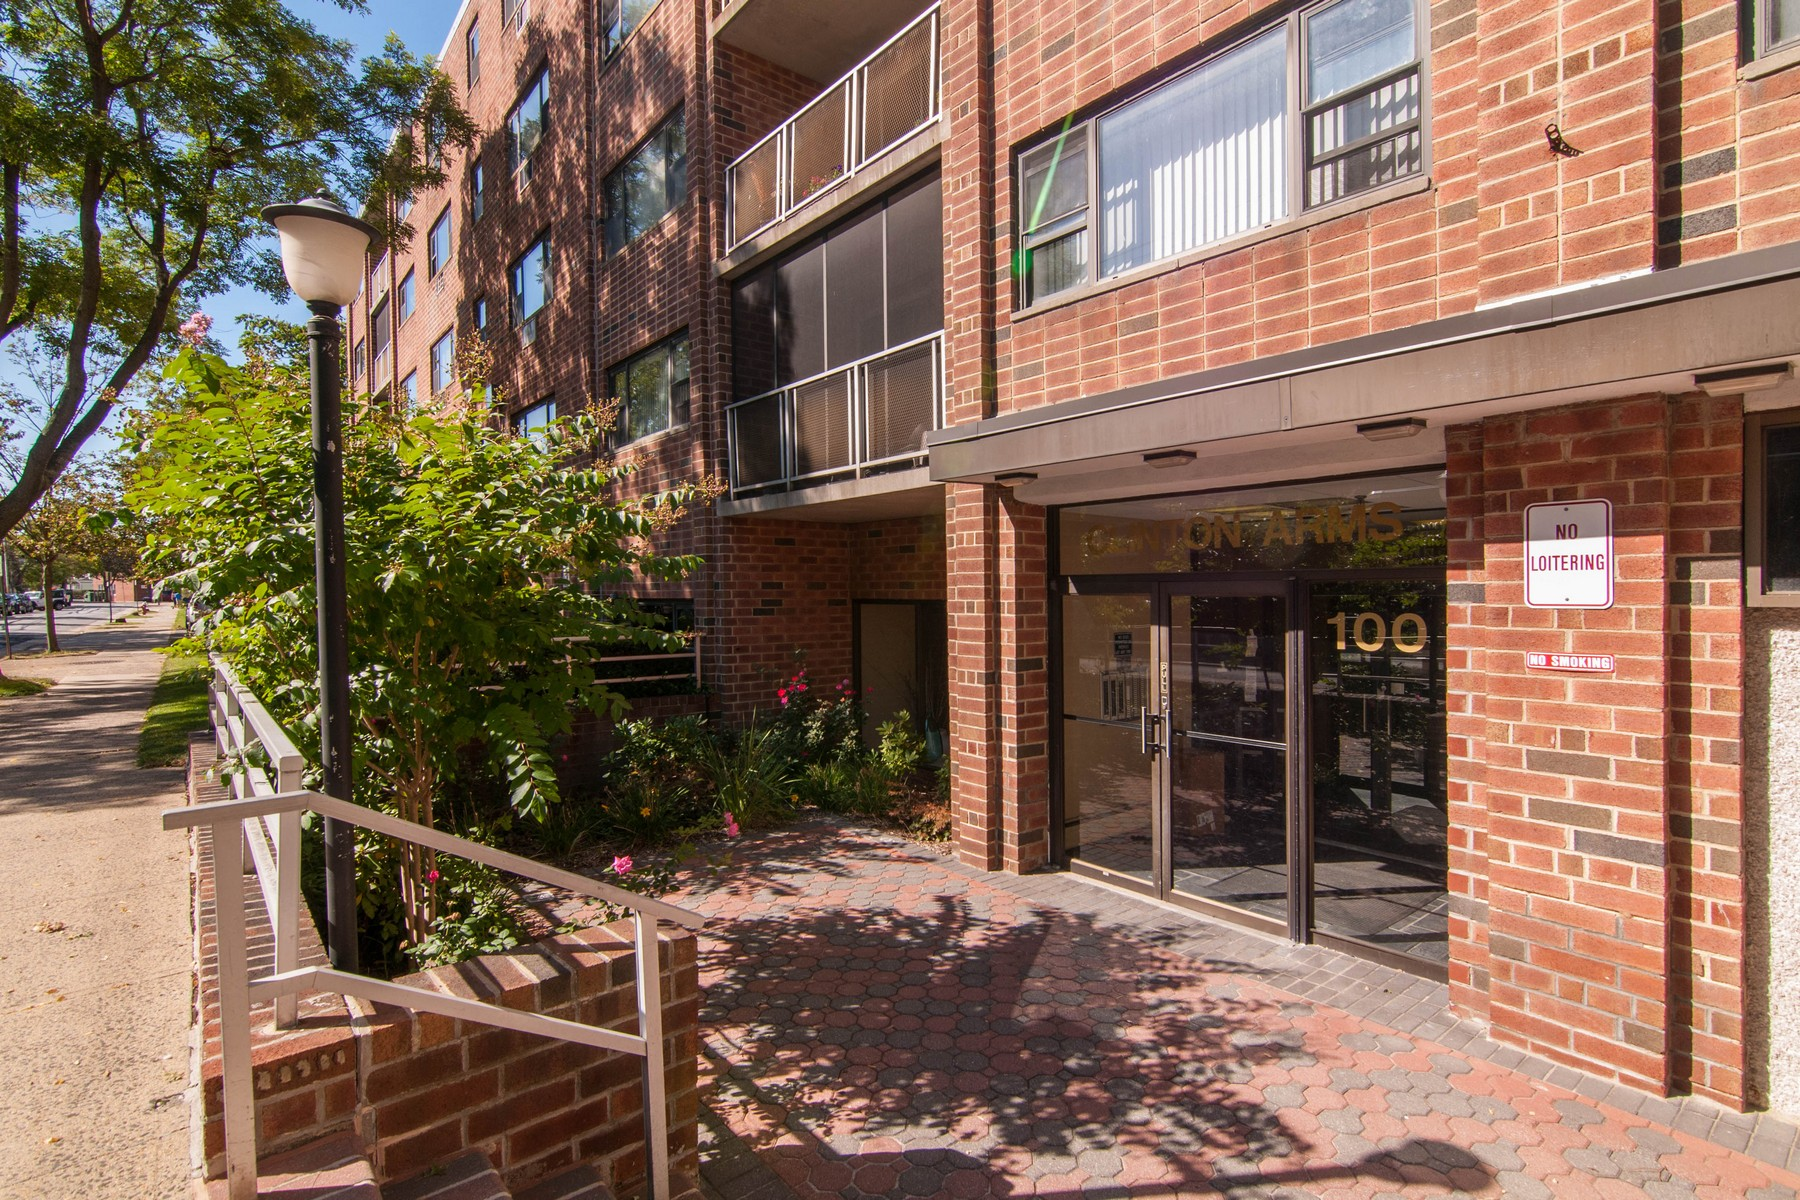 شقة للـ Rent في 100 Clinton Ave 100 Clinton Ave Mineola, New York, 11501 United States